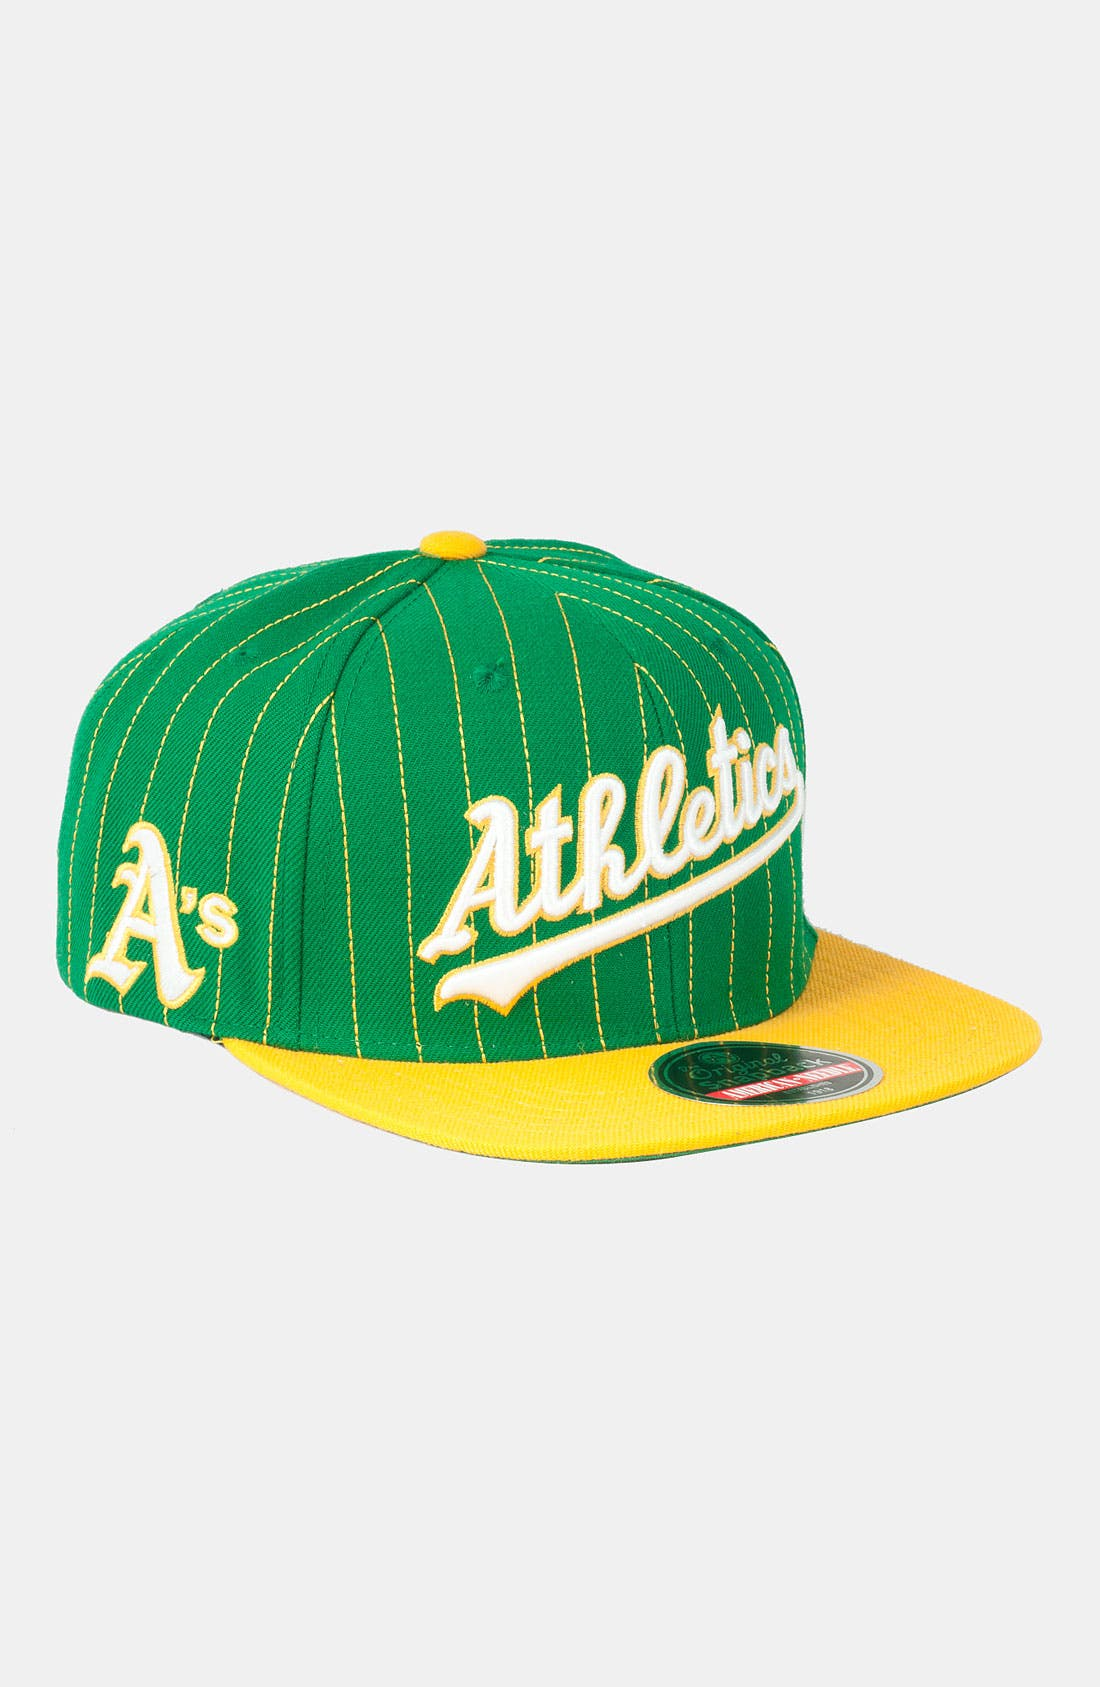 Alternate Image 1 Selected - American Needle 'Athletics' Snapback Baseball Cap